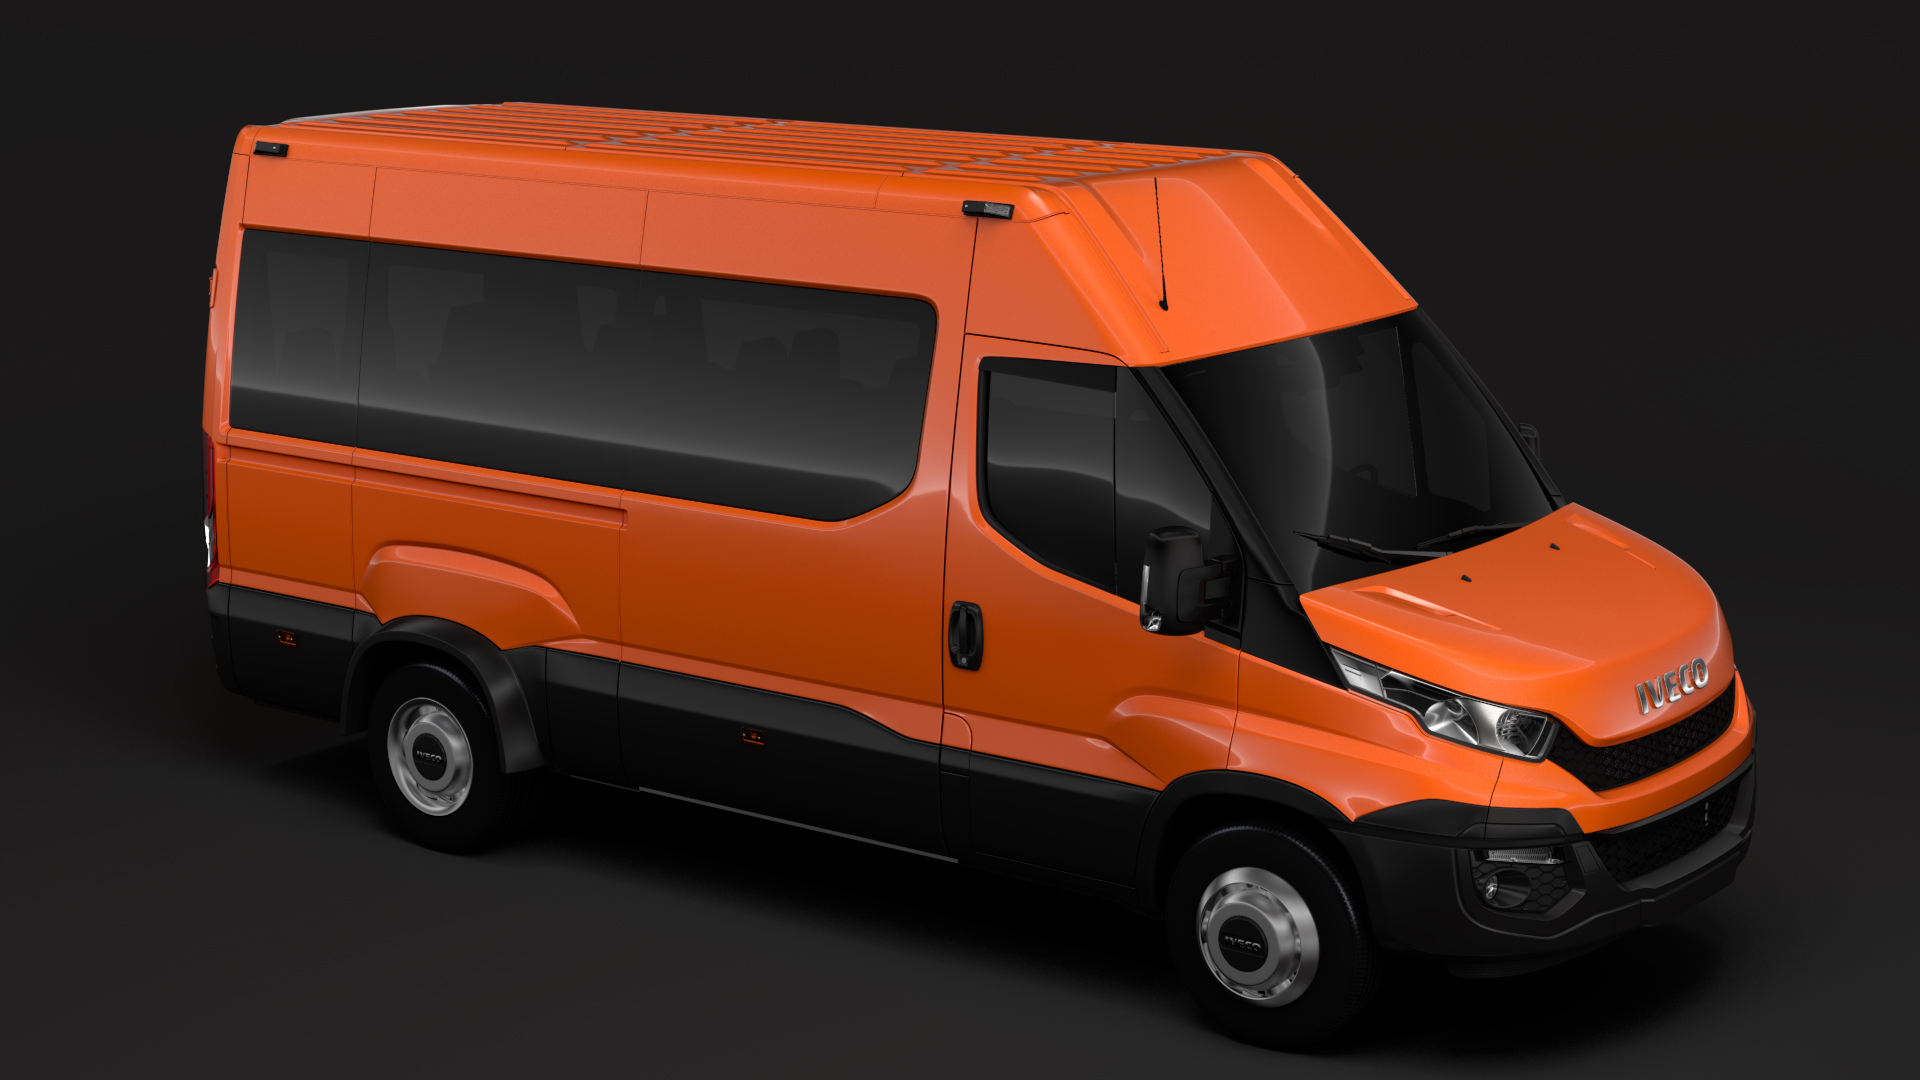 iveco daily minibus l3h2 2014-2016 3d model max fbx c4d lwo ma mb hrc xsi obj 276050